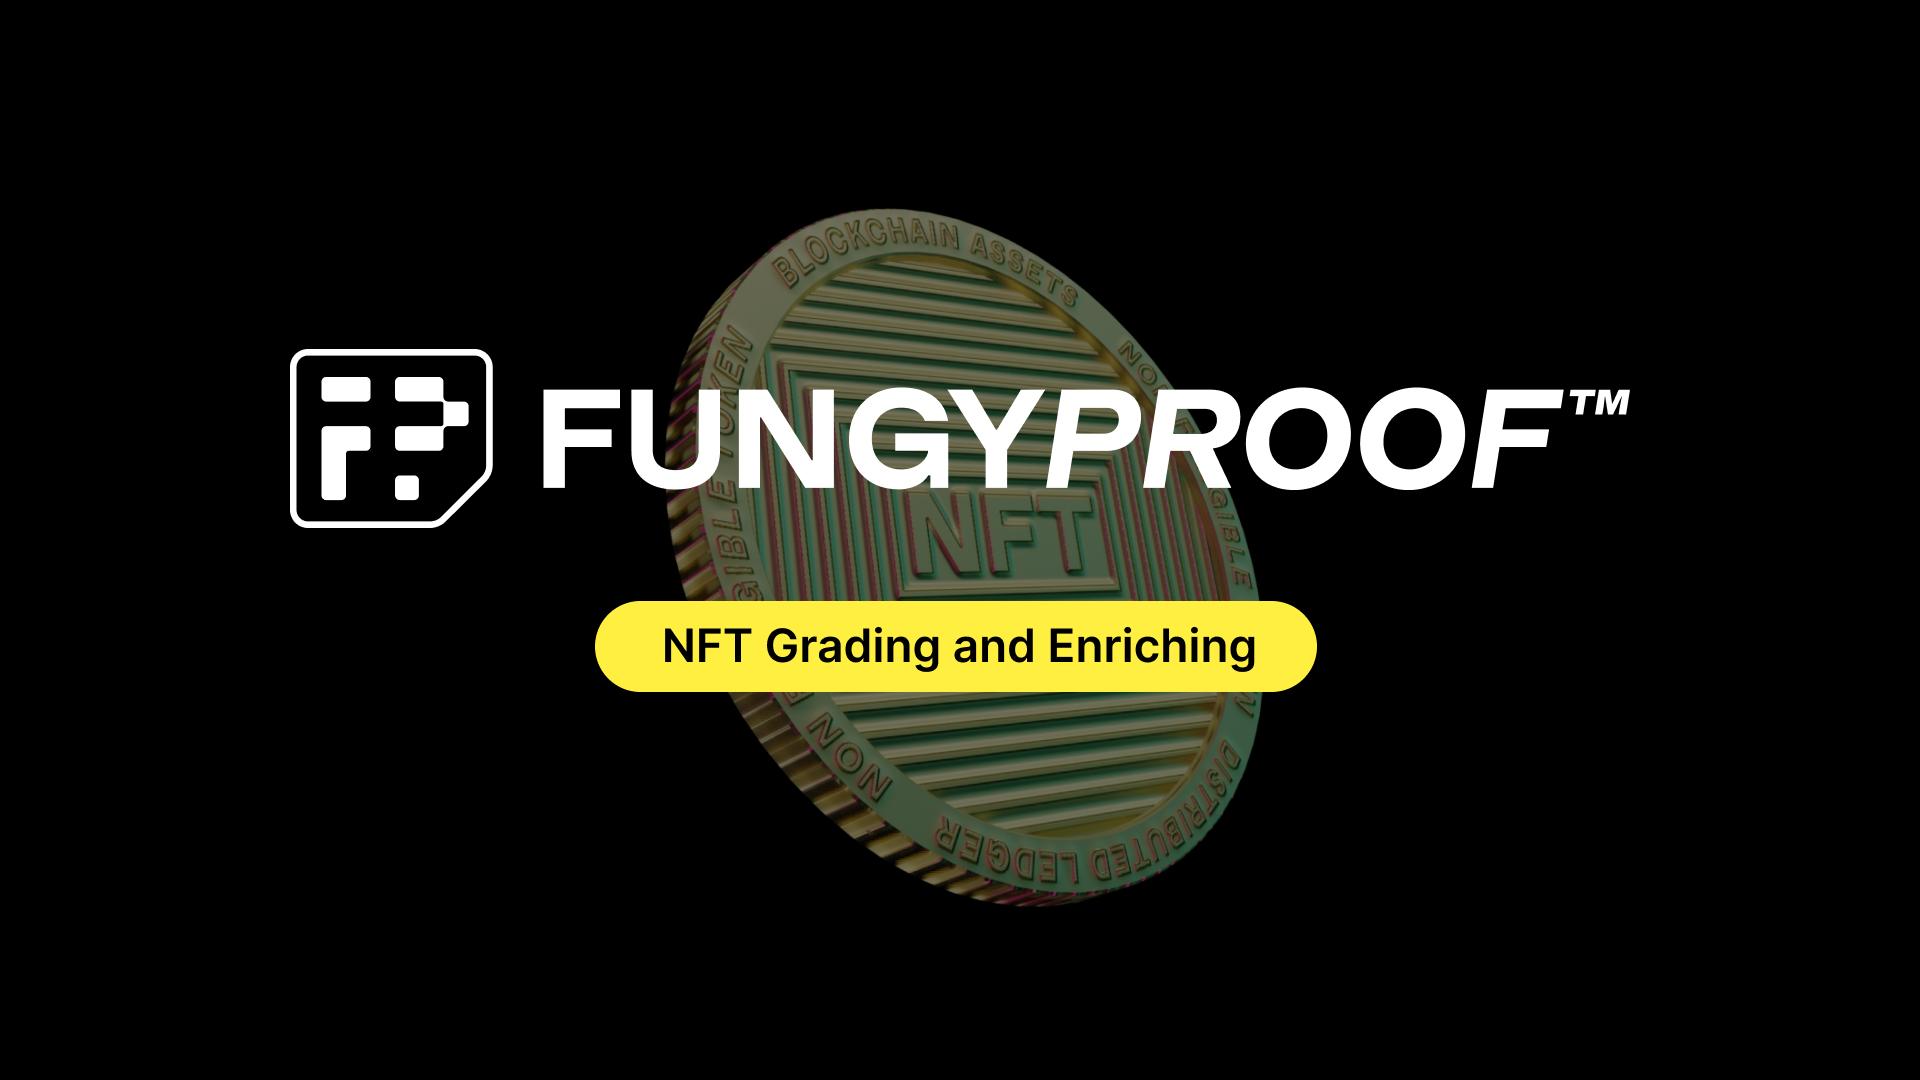 FungyProof showcase